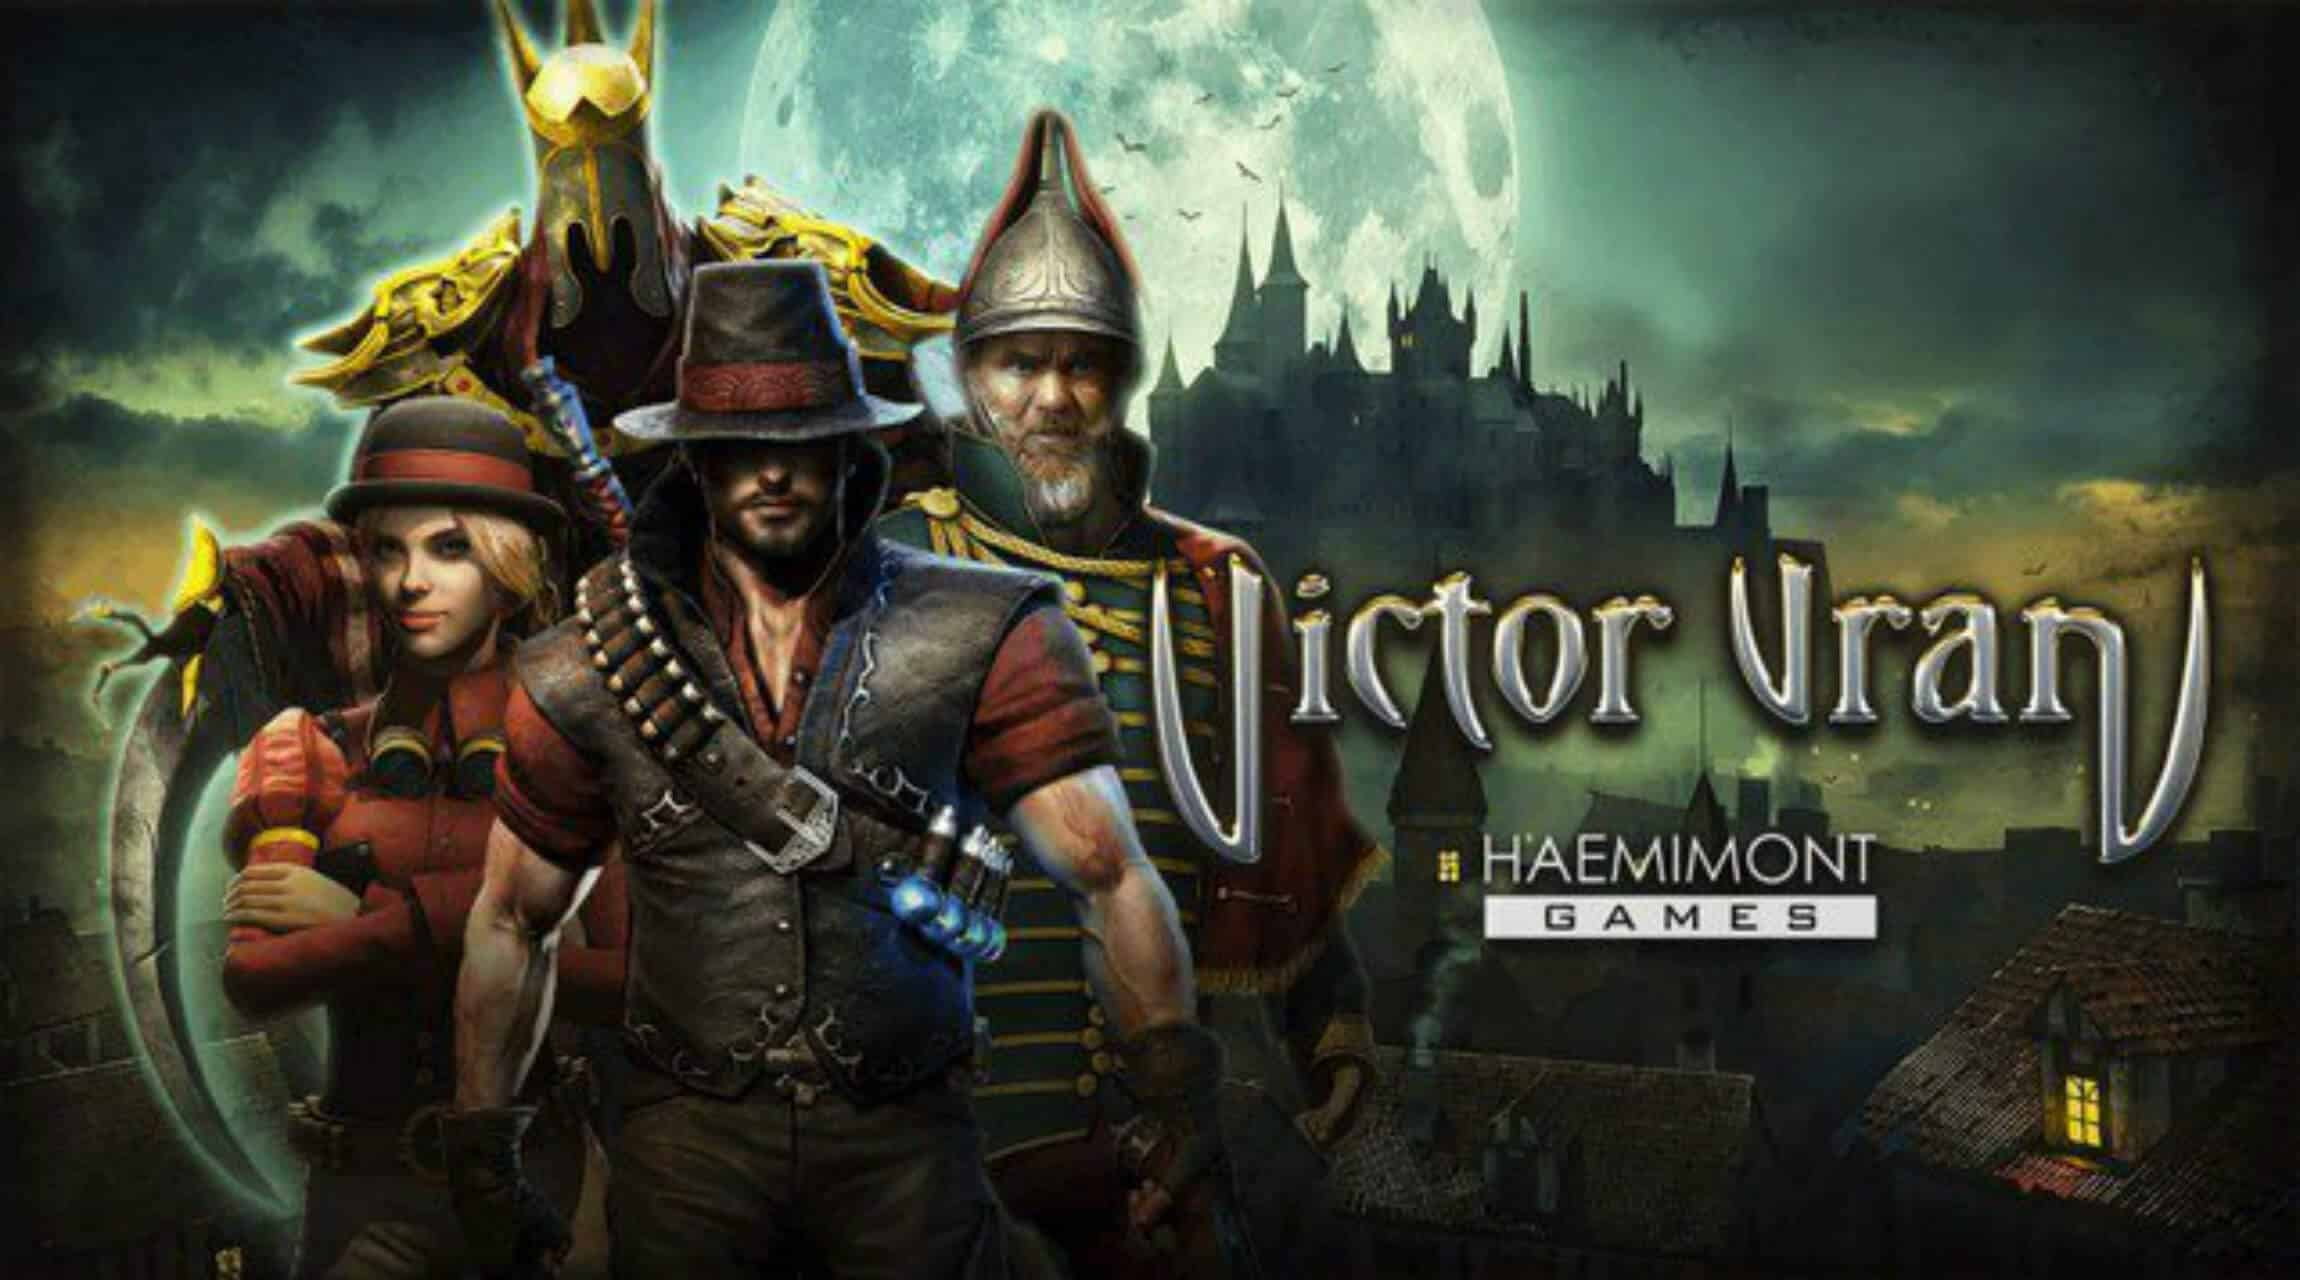 victor vran-Main Featured